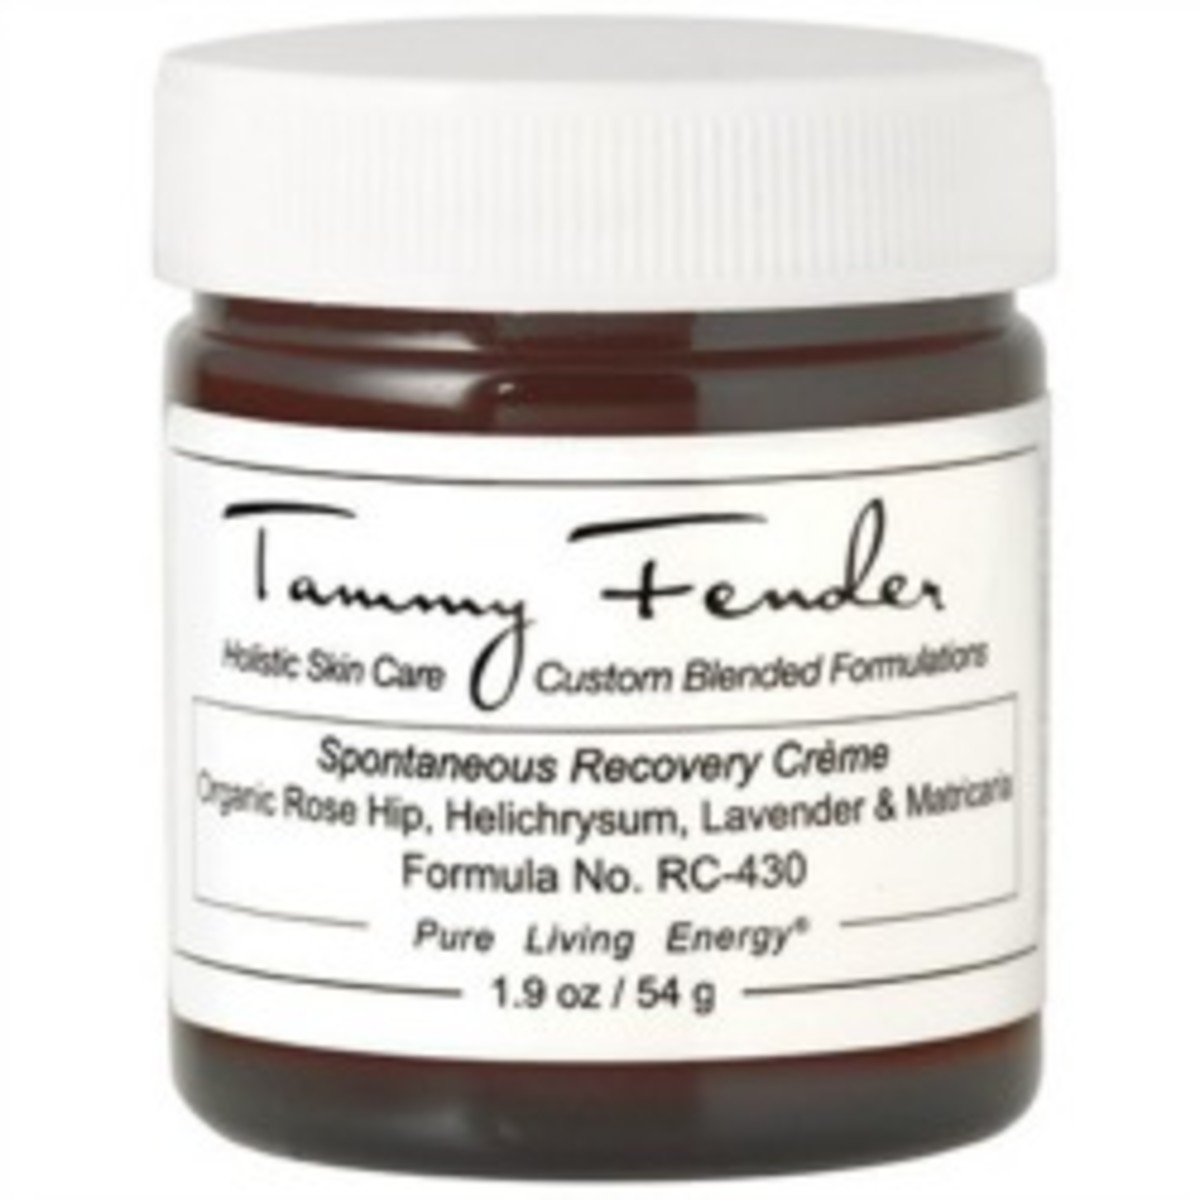 Sensitive Skin Tammy Fender Spontaneous Recovery Crème